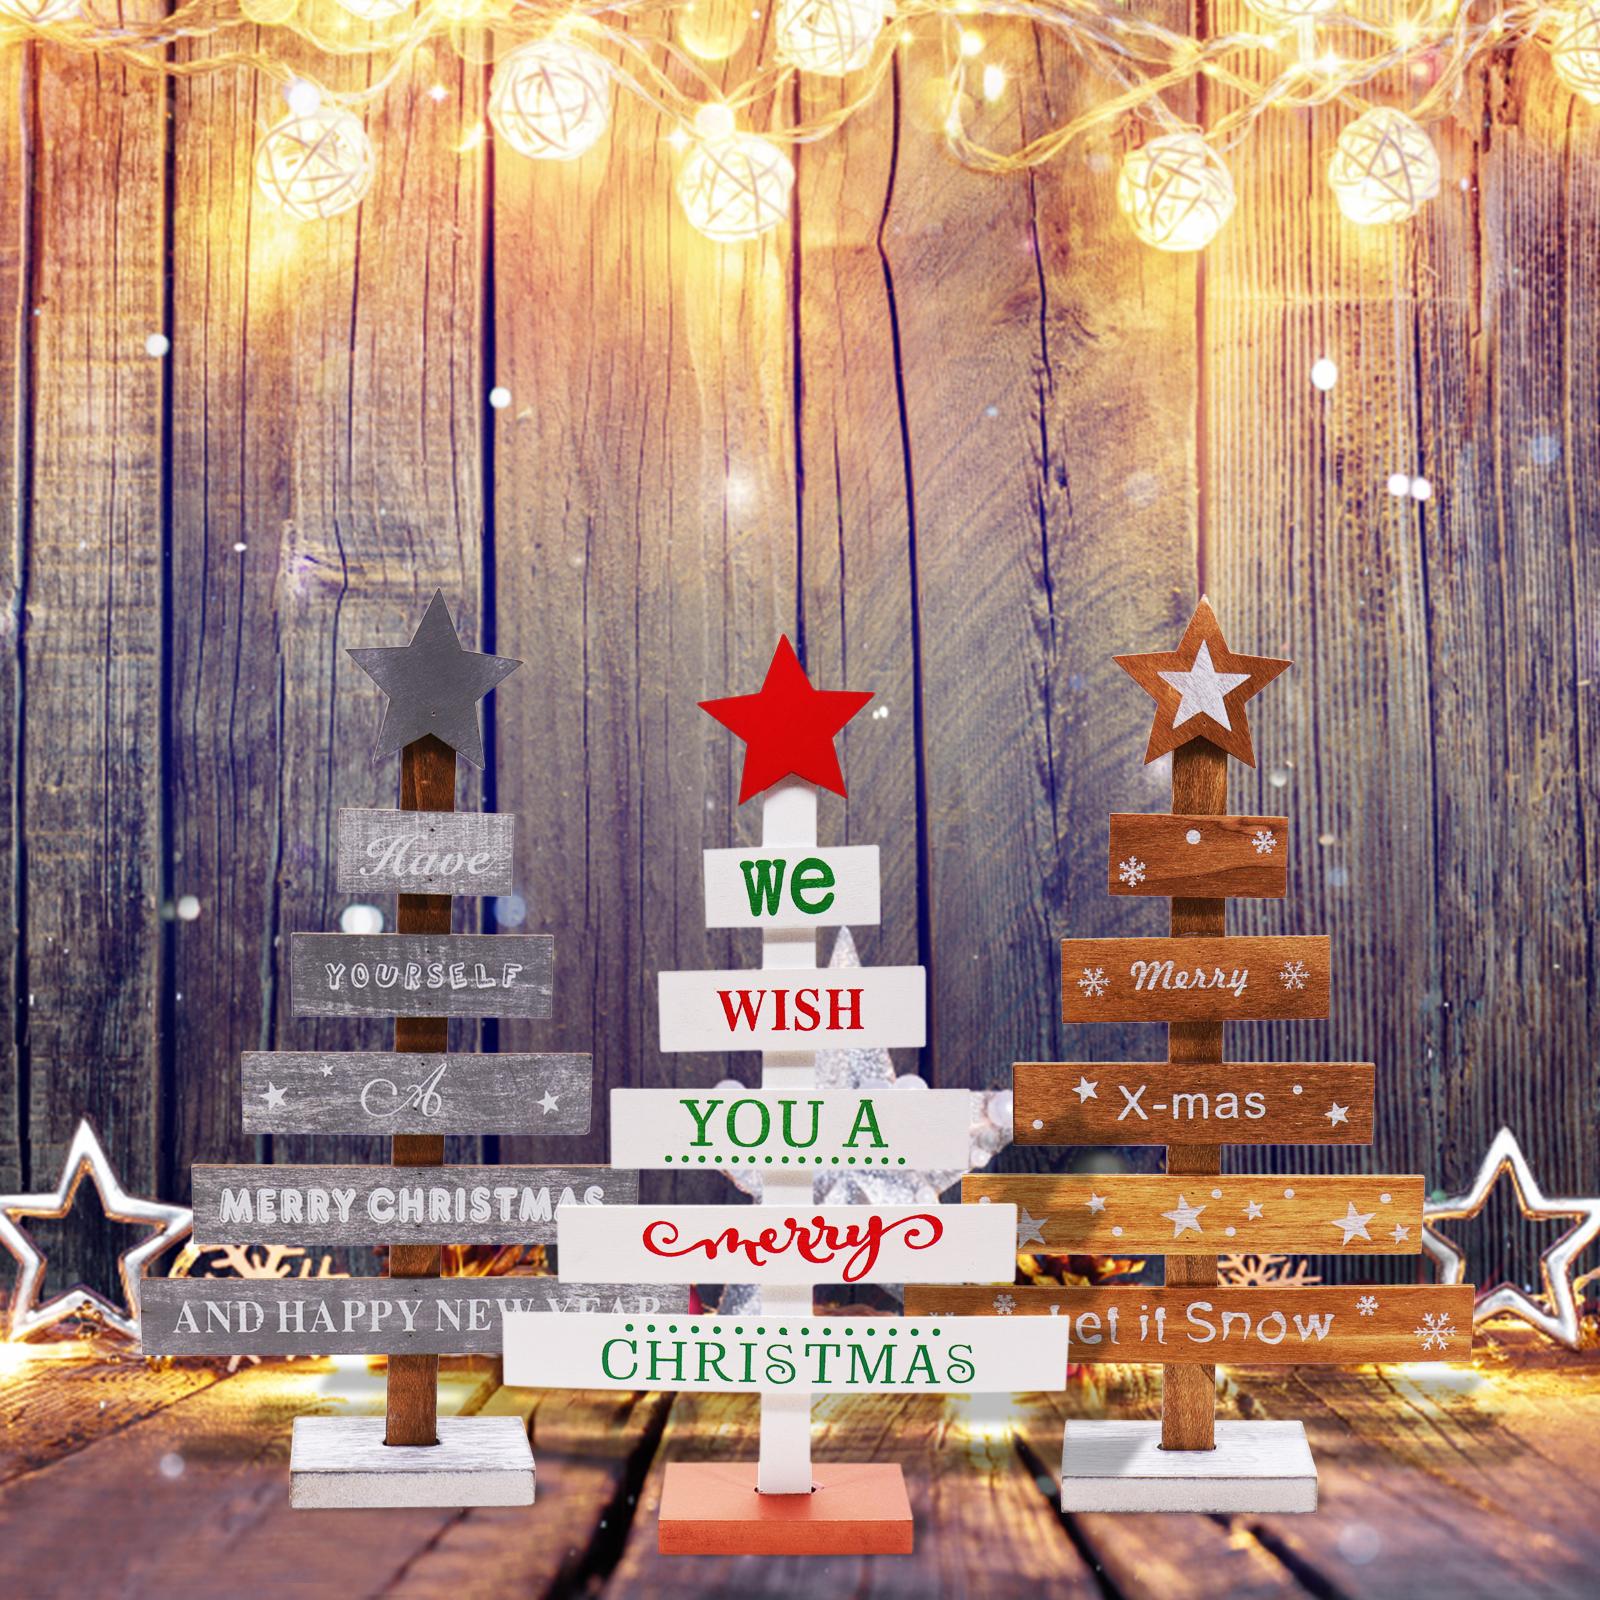 Christmas Home Decor 2019.2019 New Year Christmas Decorations For Home Christmas Wood